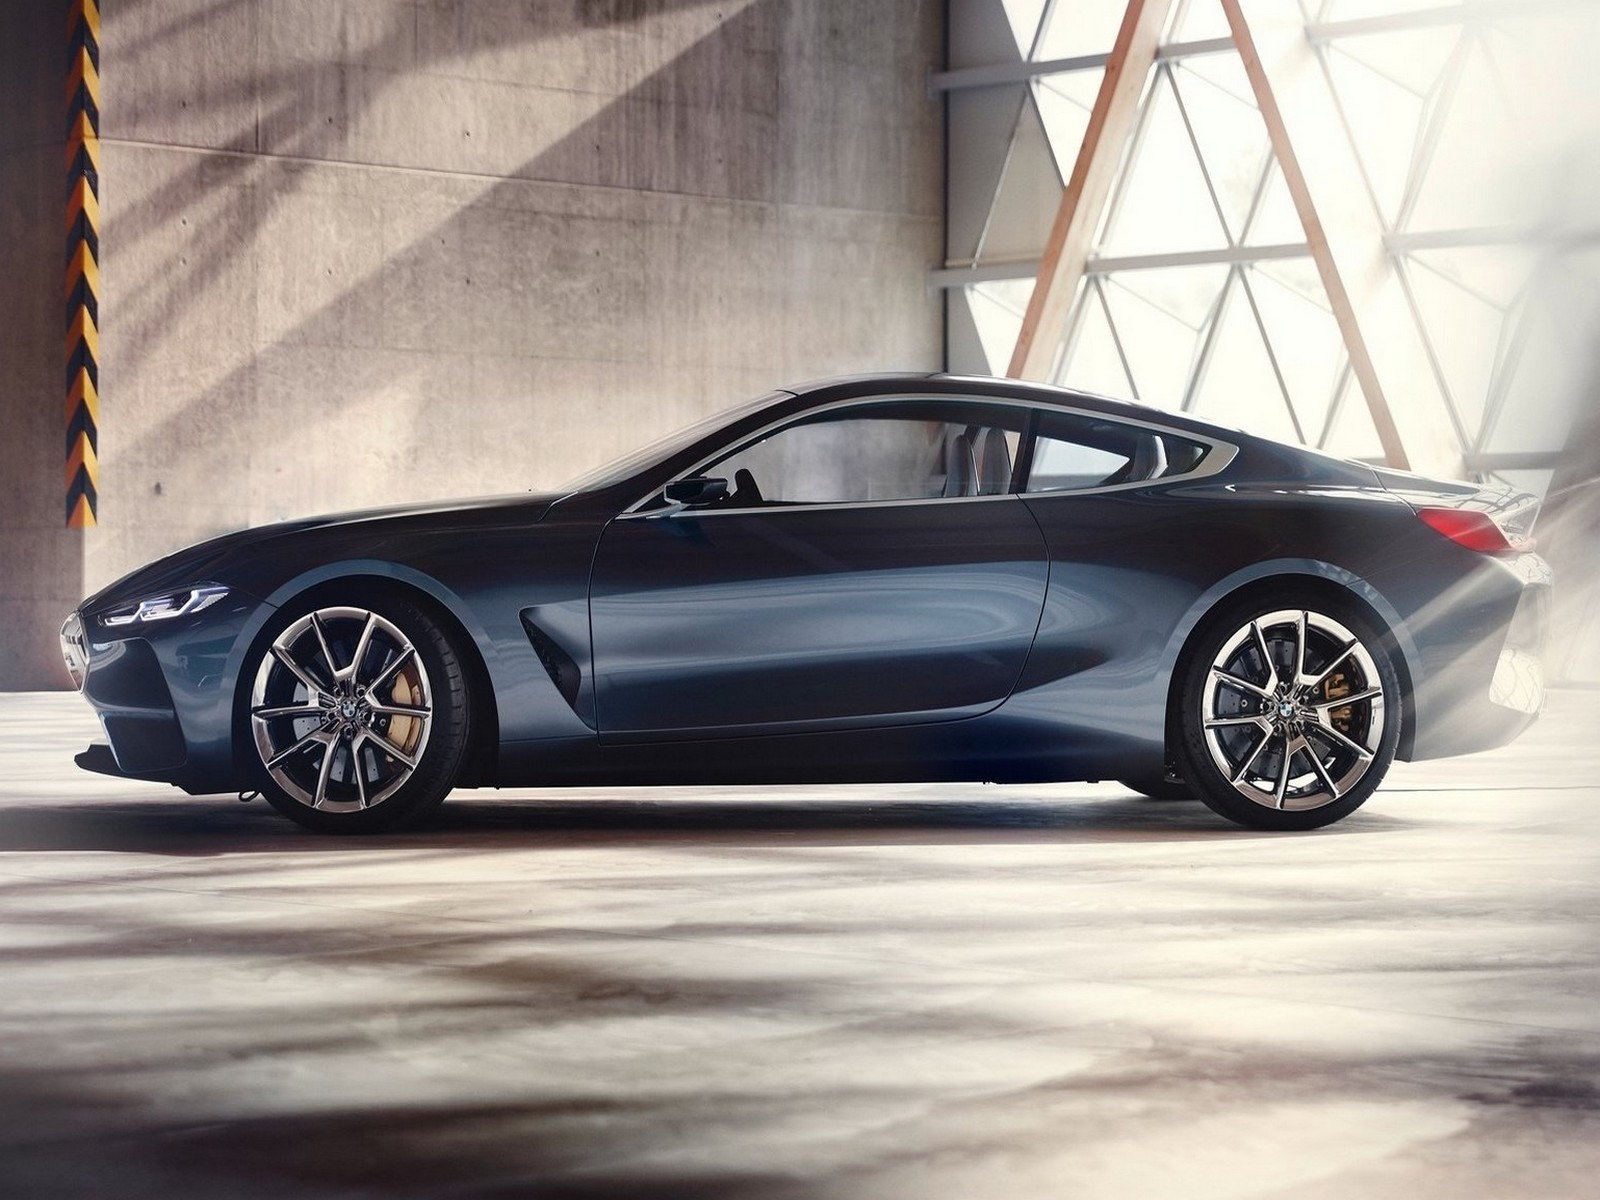 BMW 8 Series Concept 2017